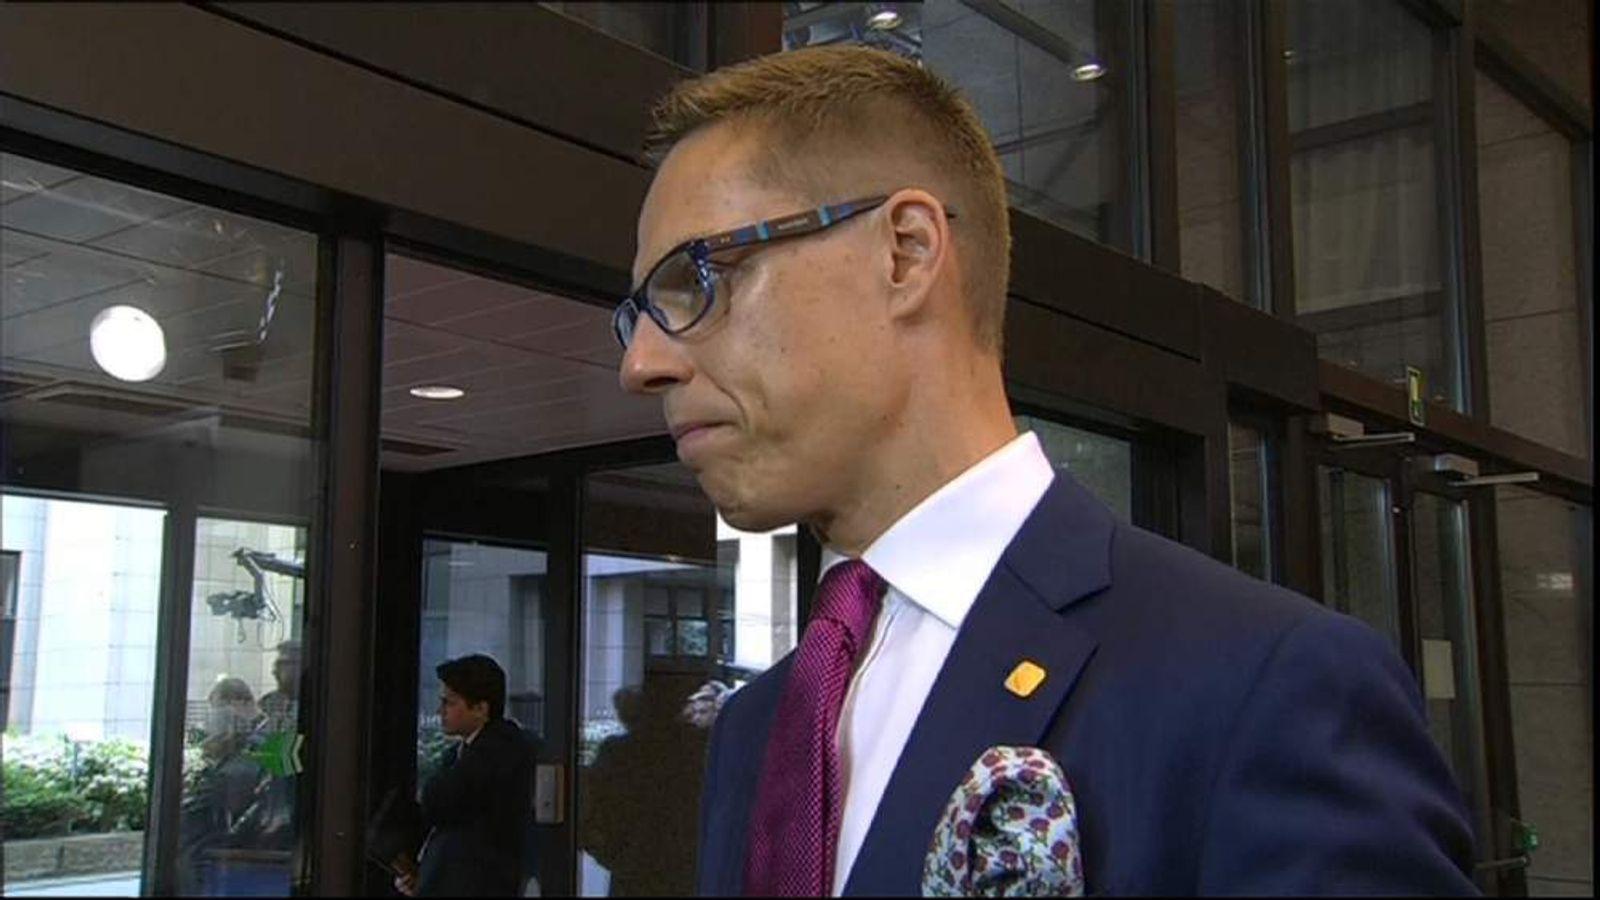 Finnish PM Alexander Stubb